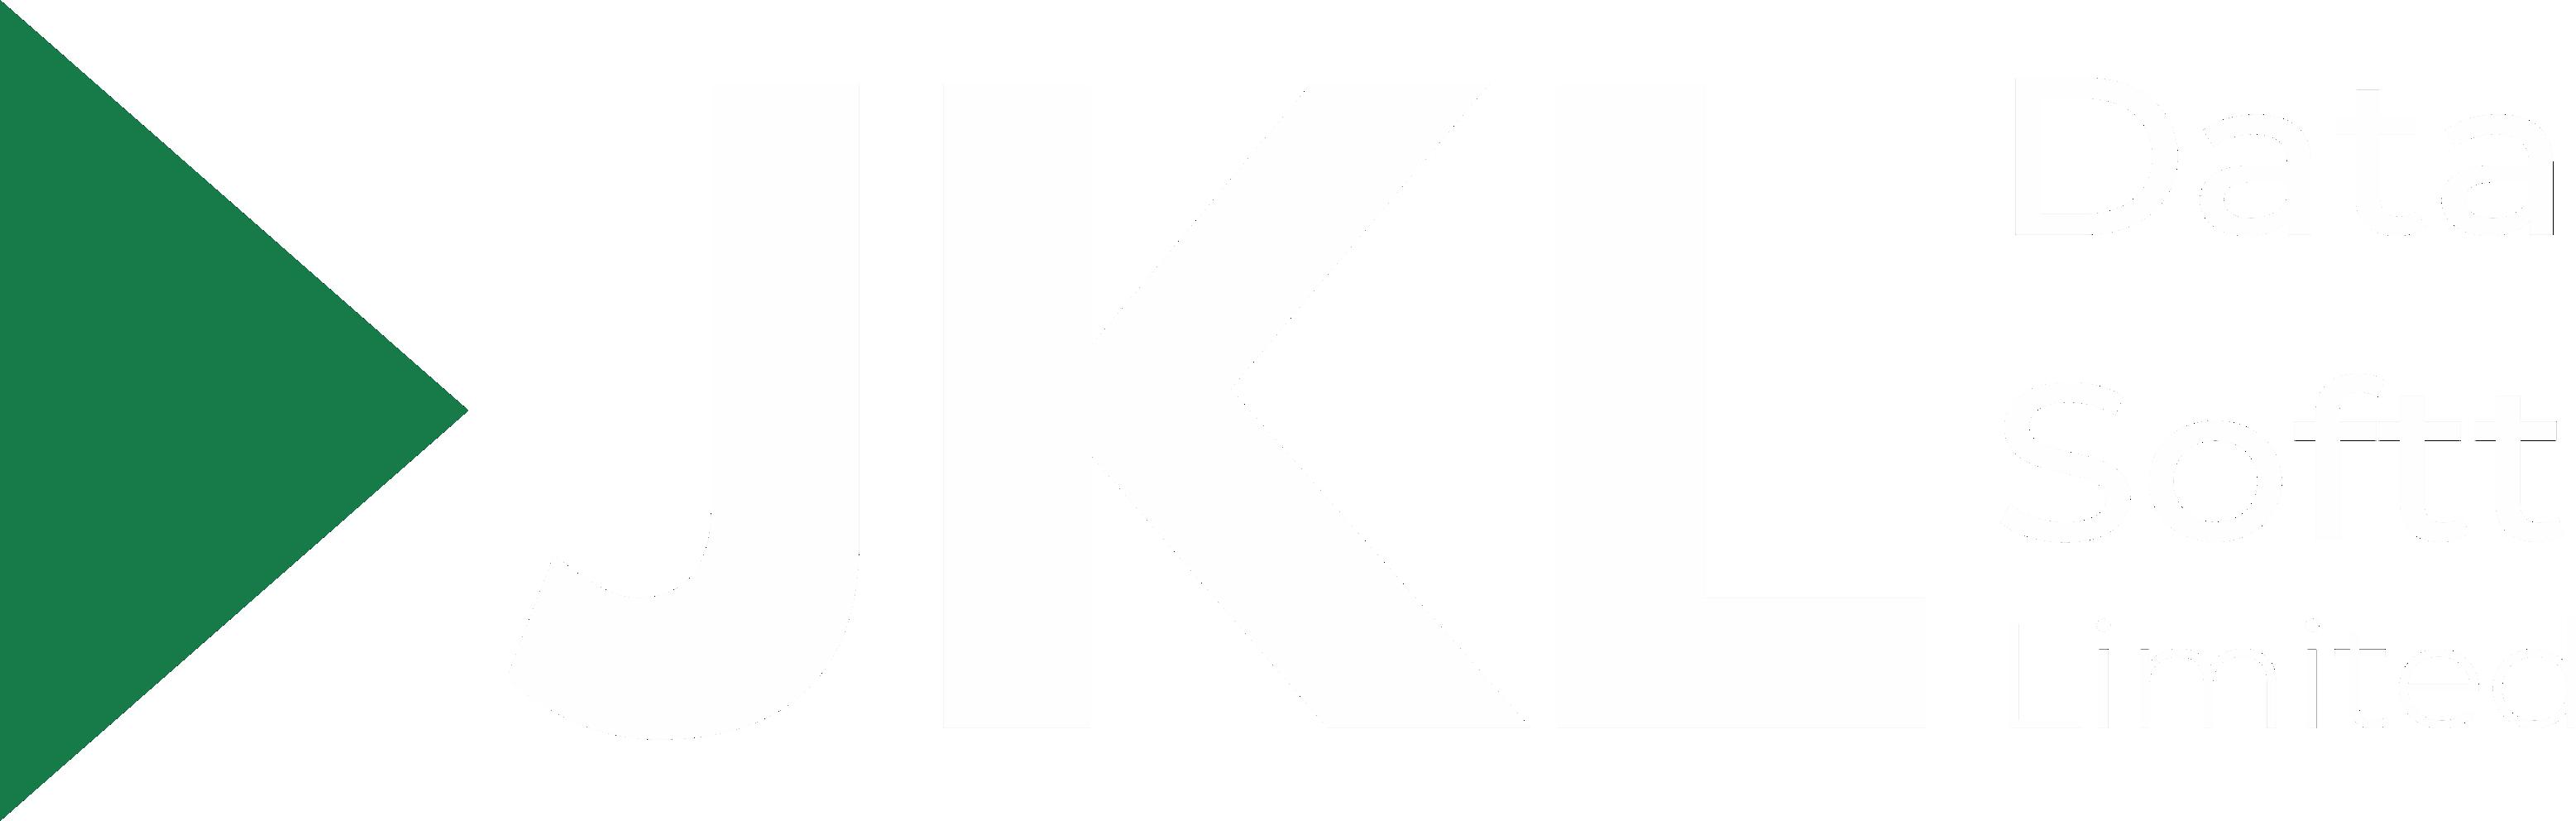 JKL DataSoftt Nigeria Ltd